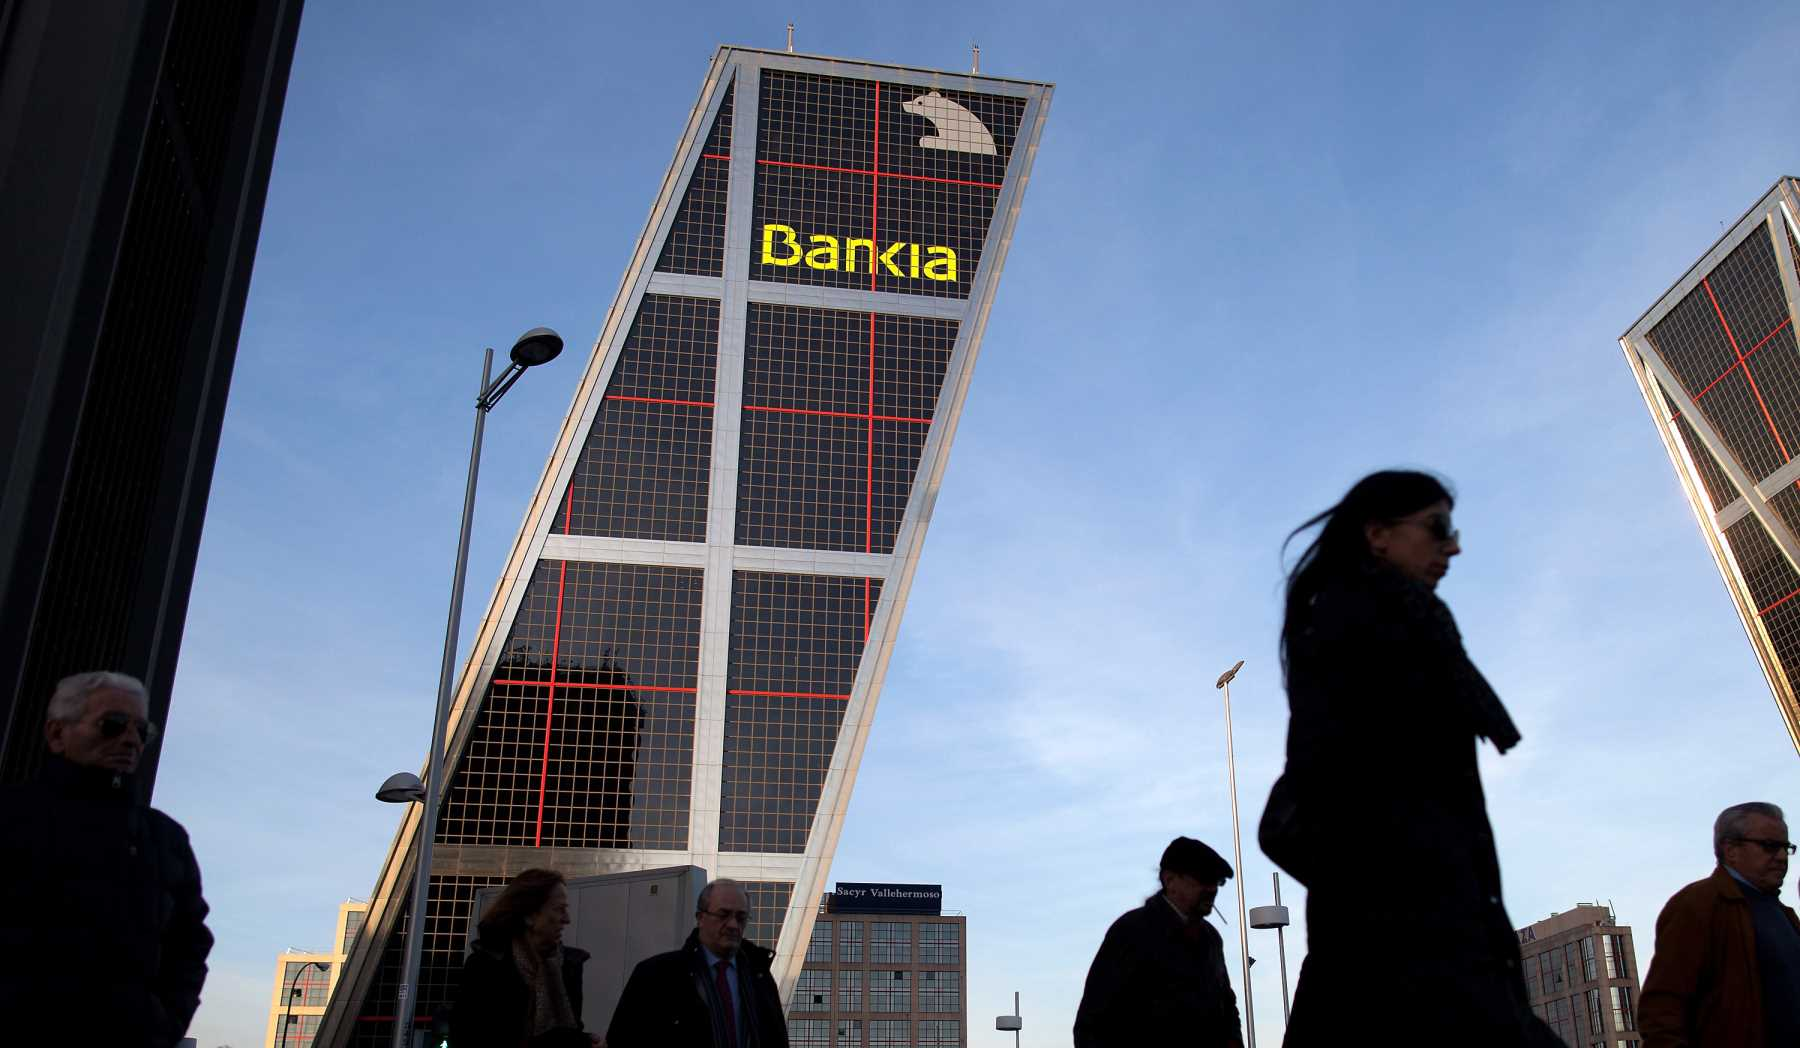 Prestamos banco bankia chowdarybm6 for Bankia internet oficina internet